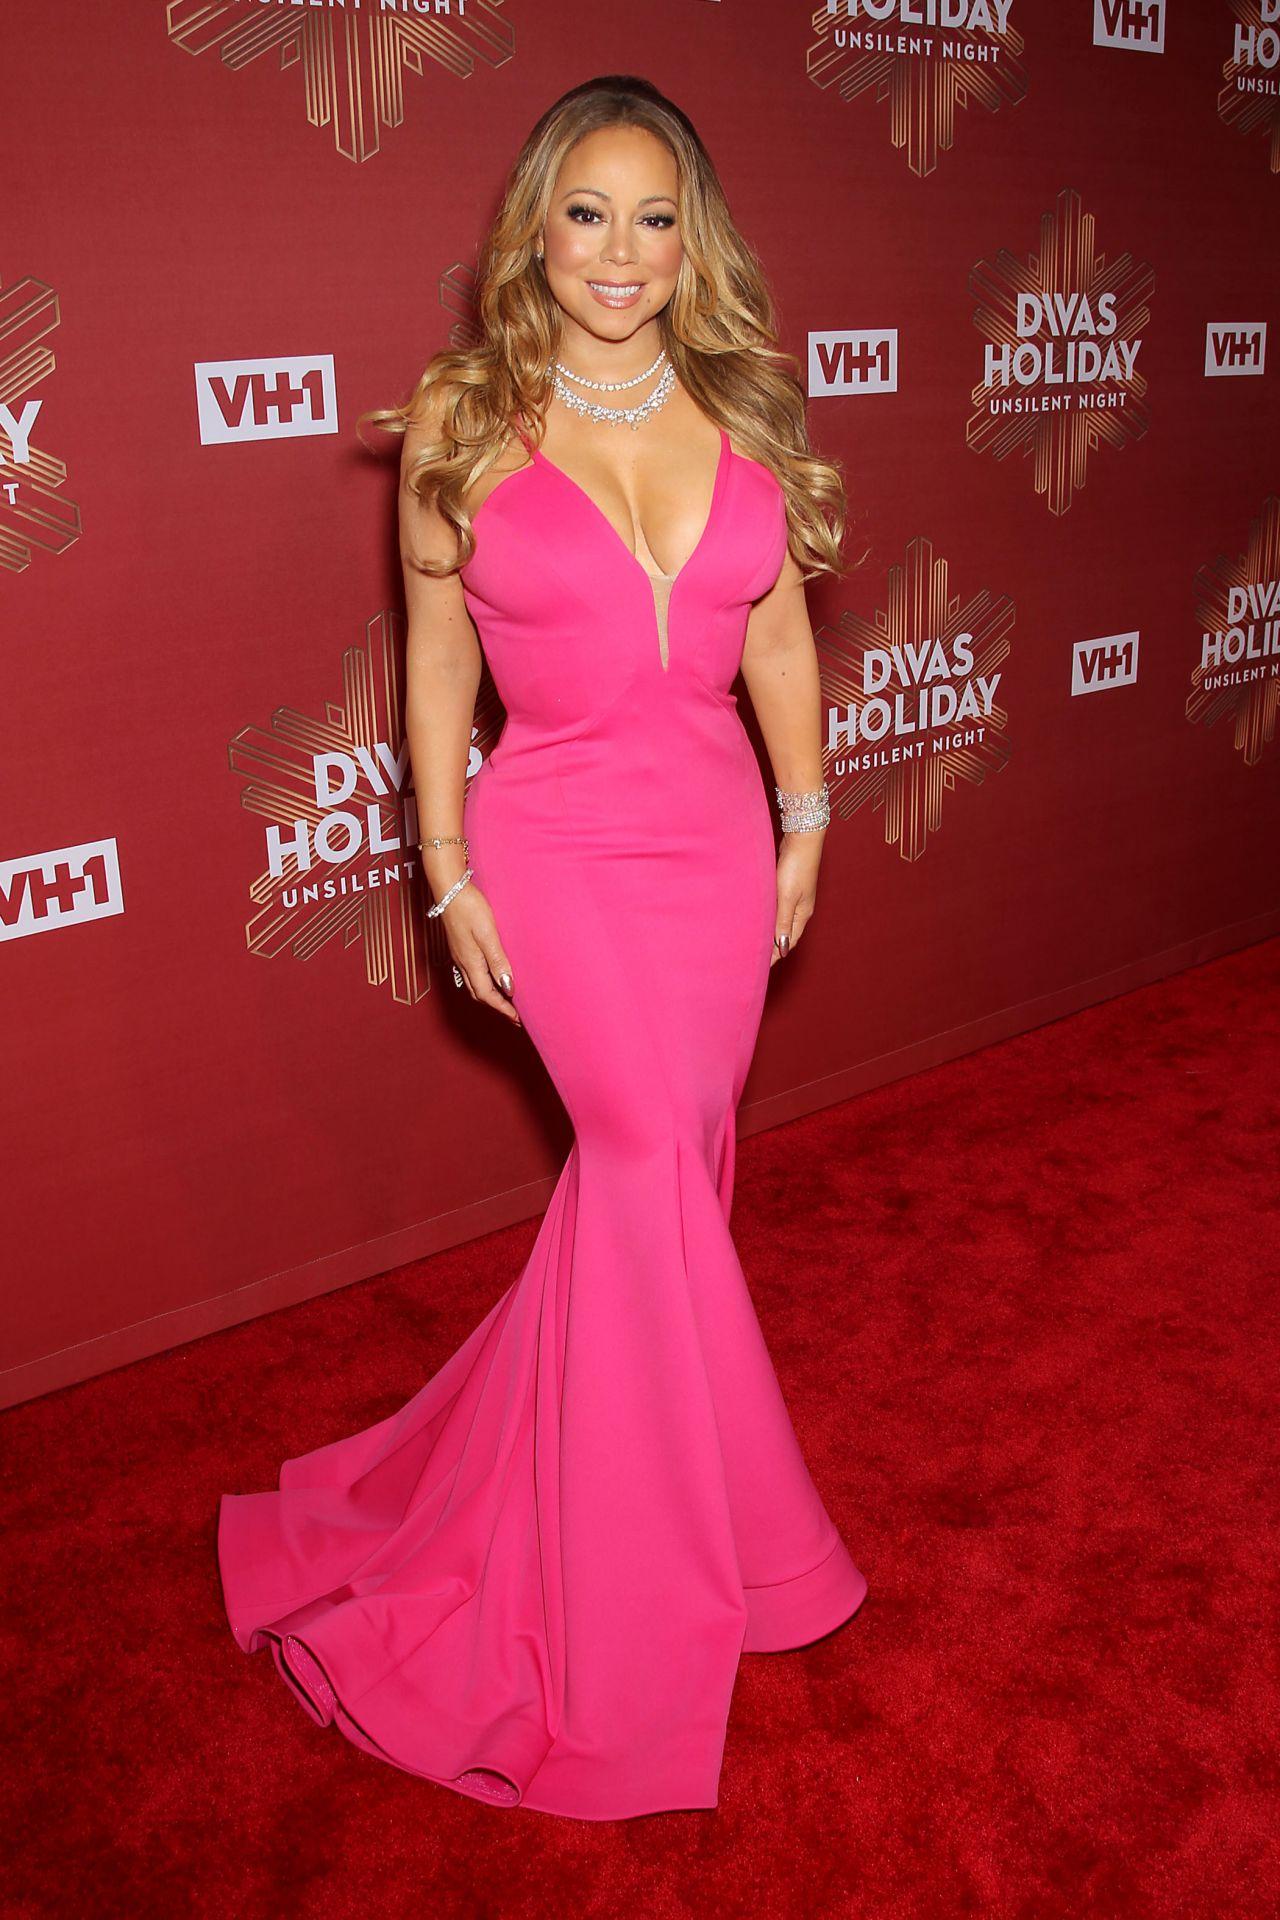 Mariah Carey 2016 Vh1 S Divas Holiday Unsilent Night In